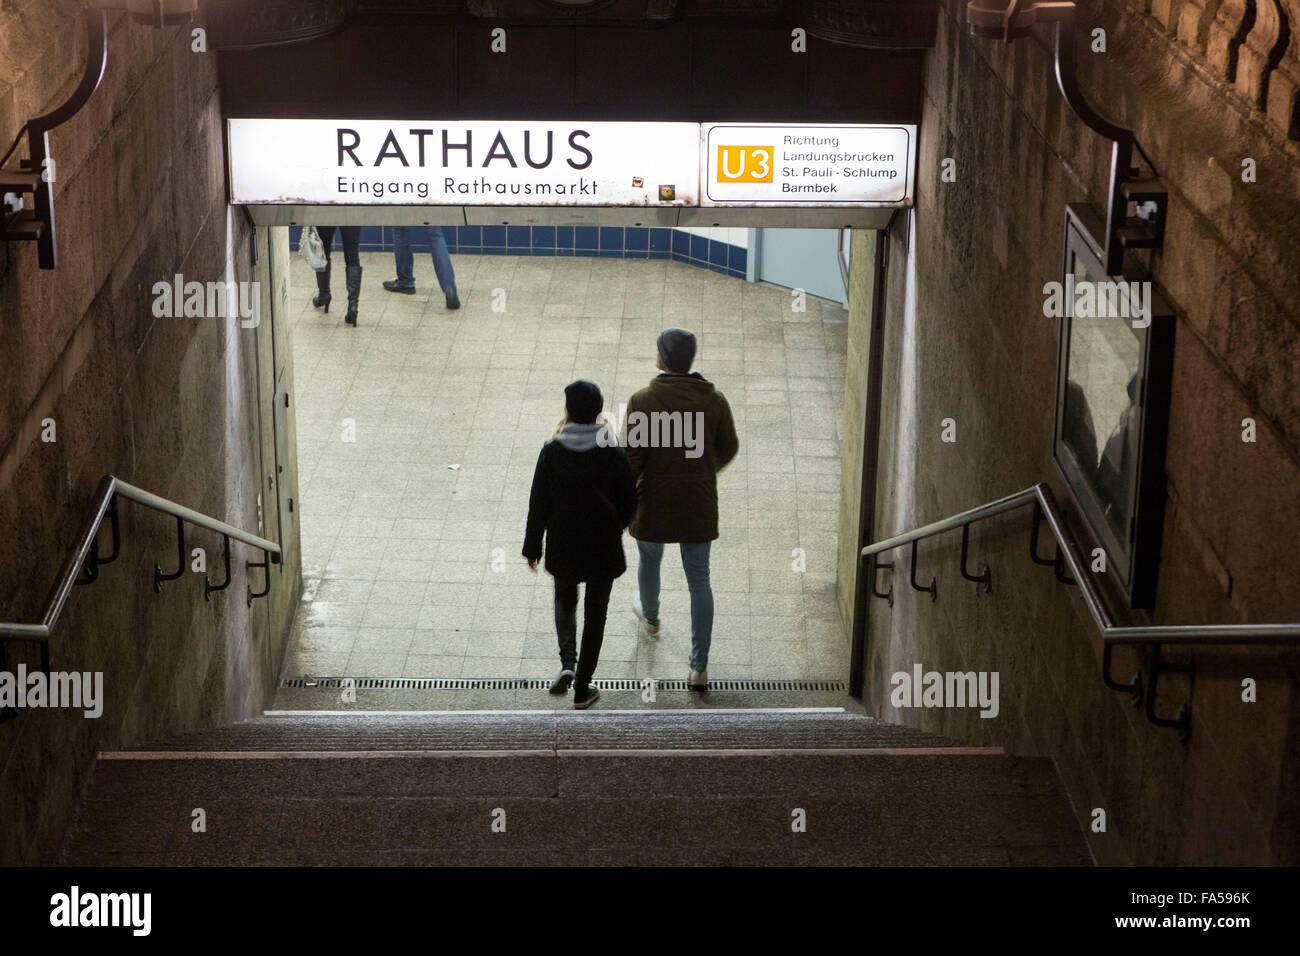 Hamburg-Deutschland. Hamburger U-Bahn Rathaus station Stockbild